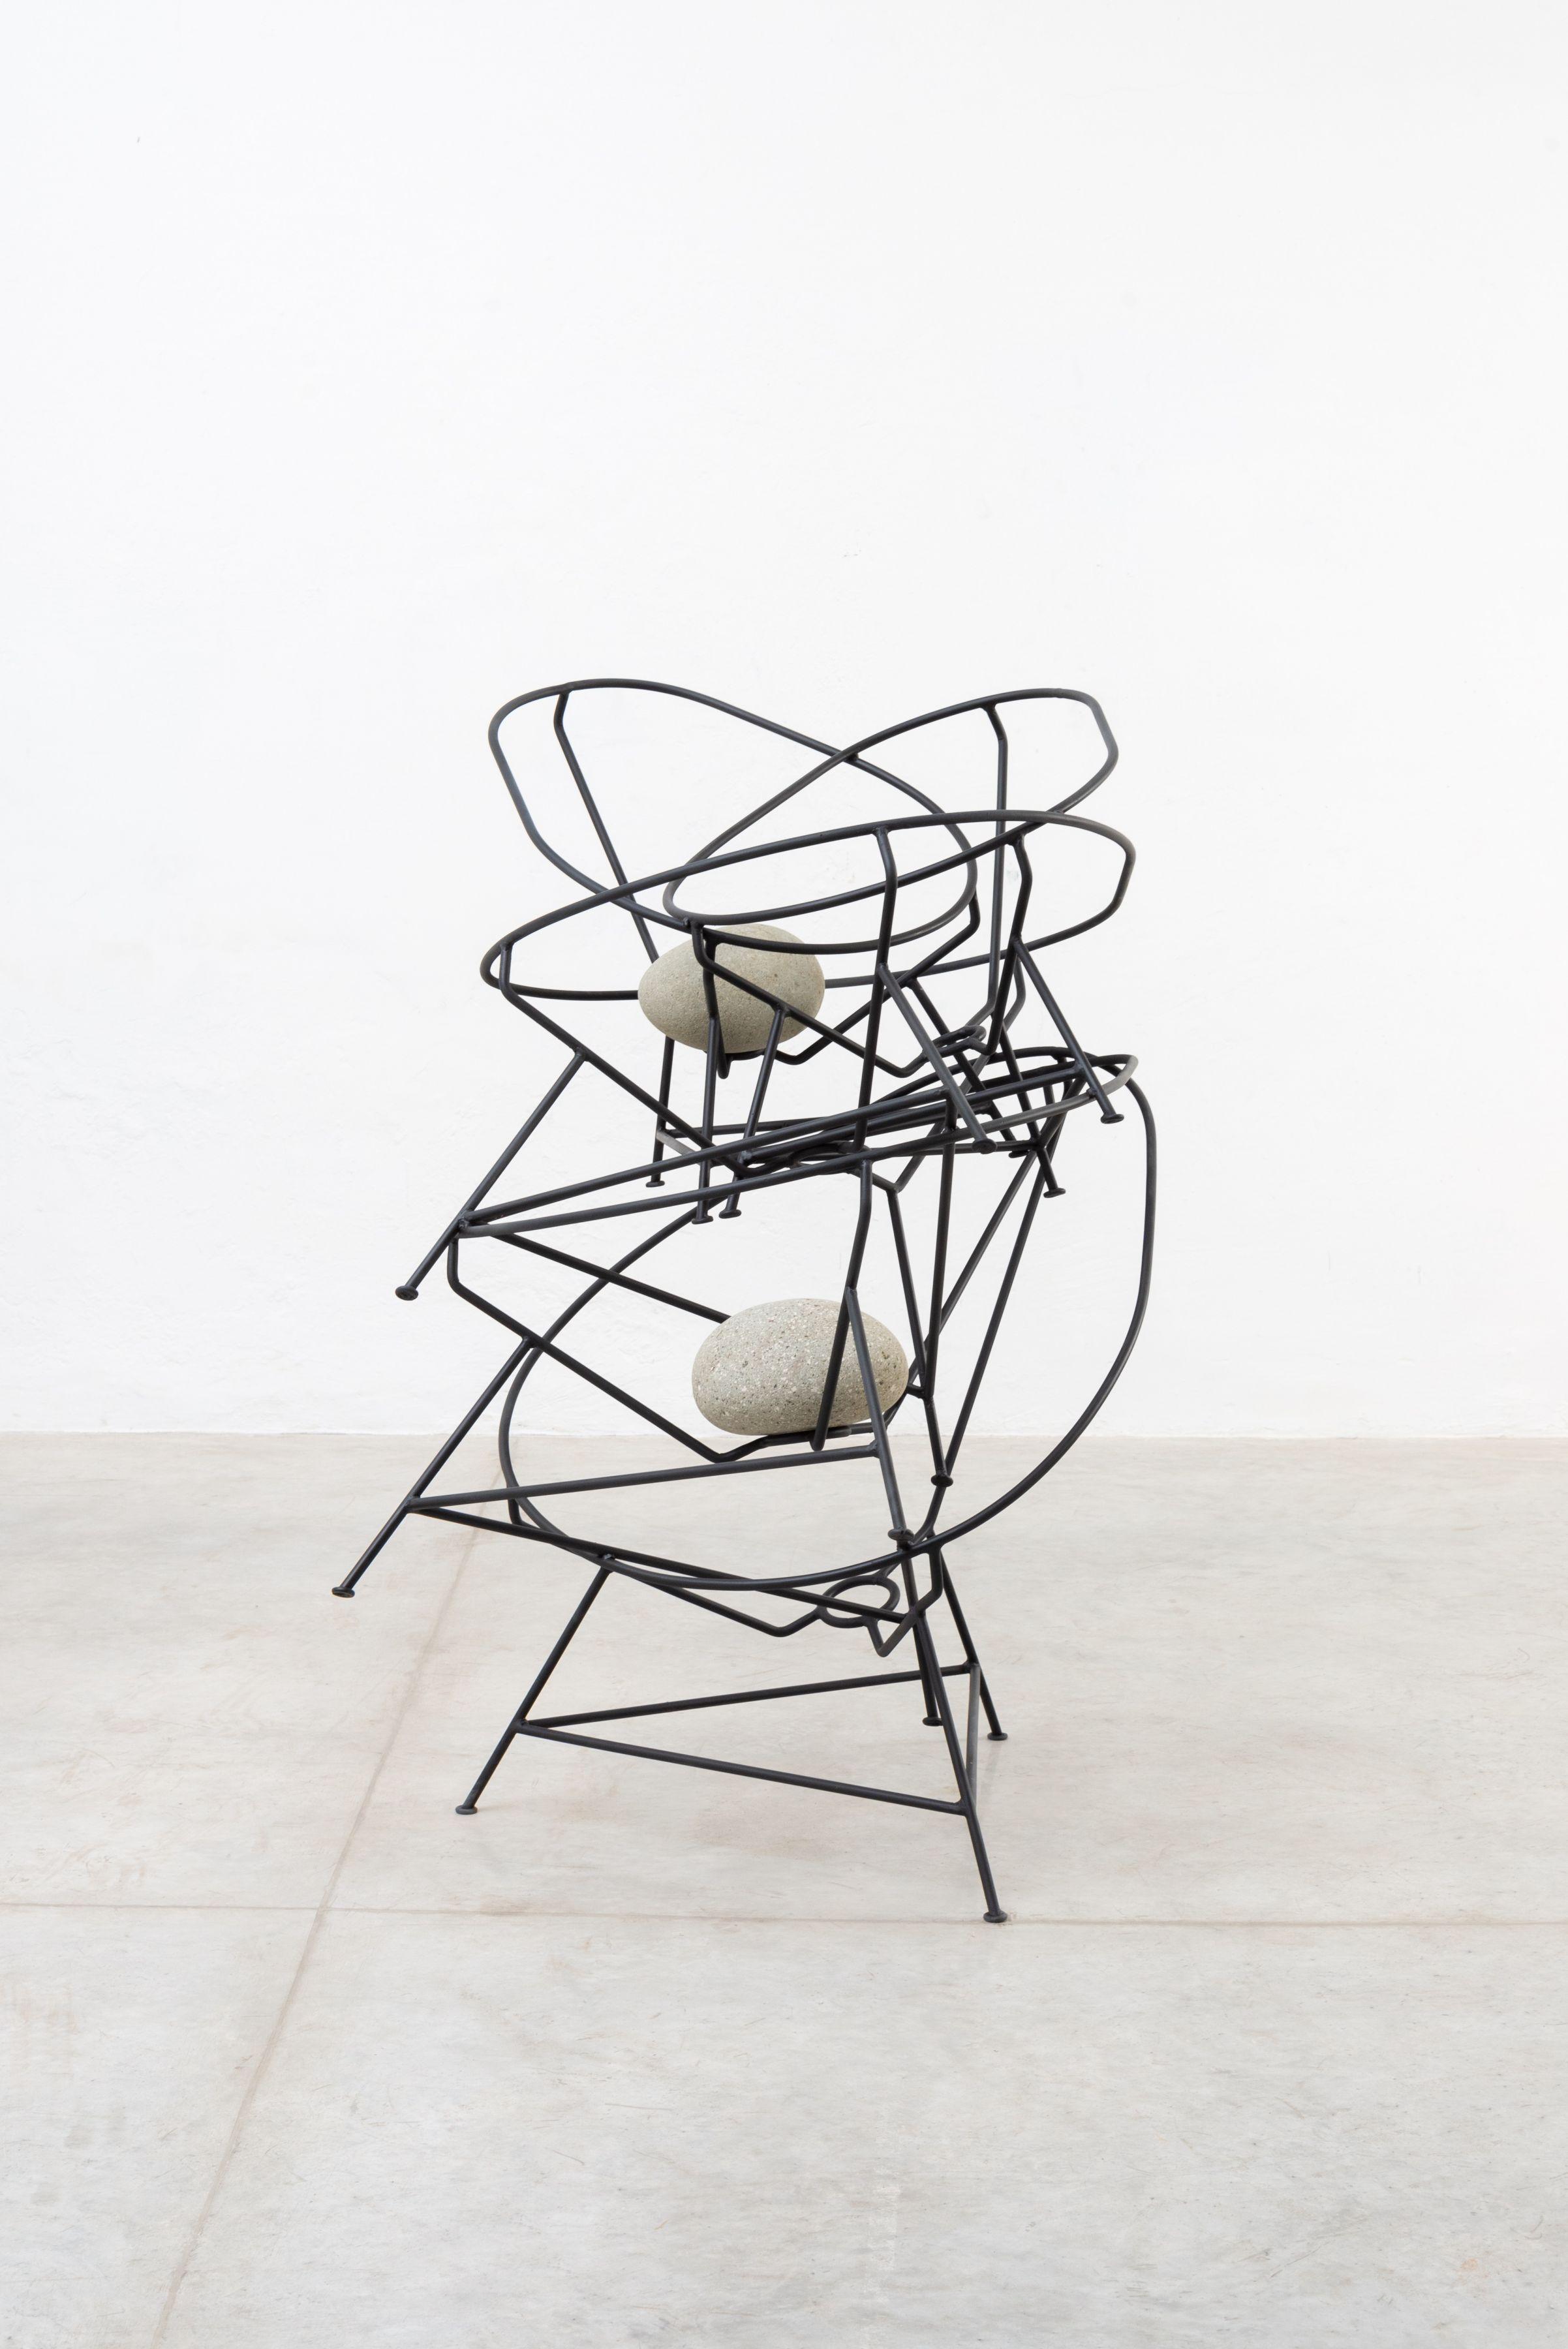 sculpture 21.2